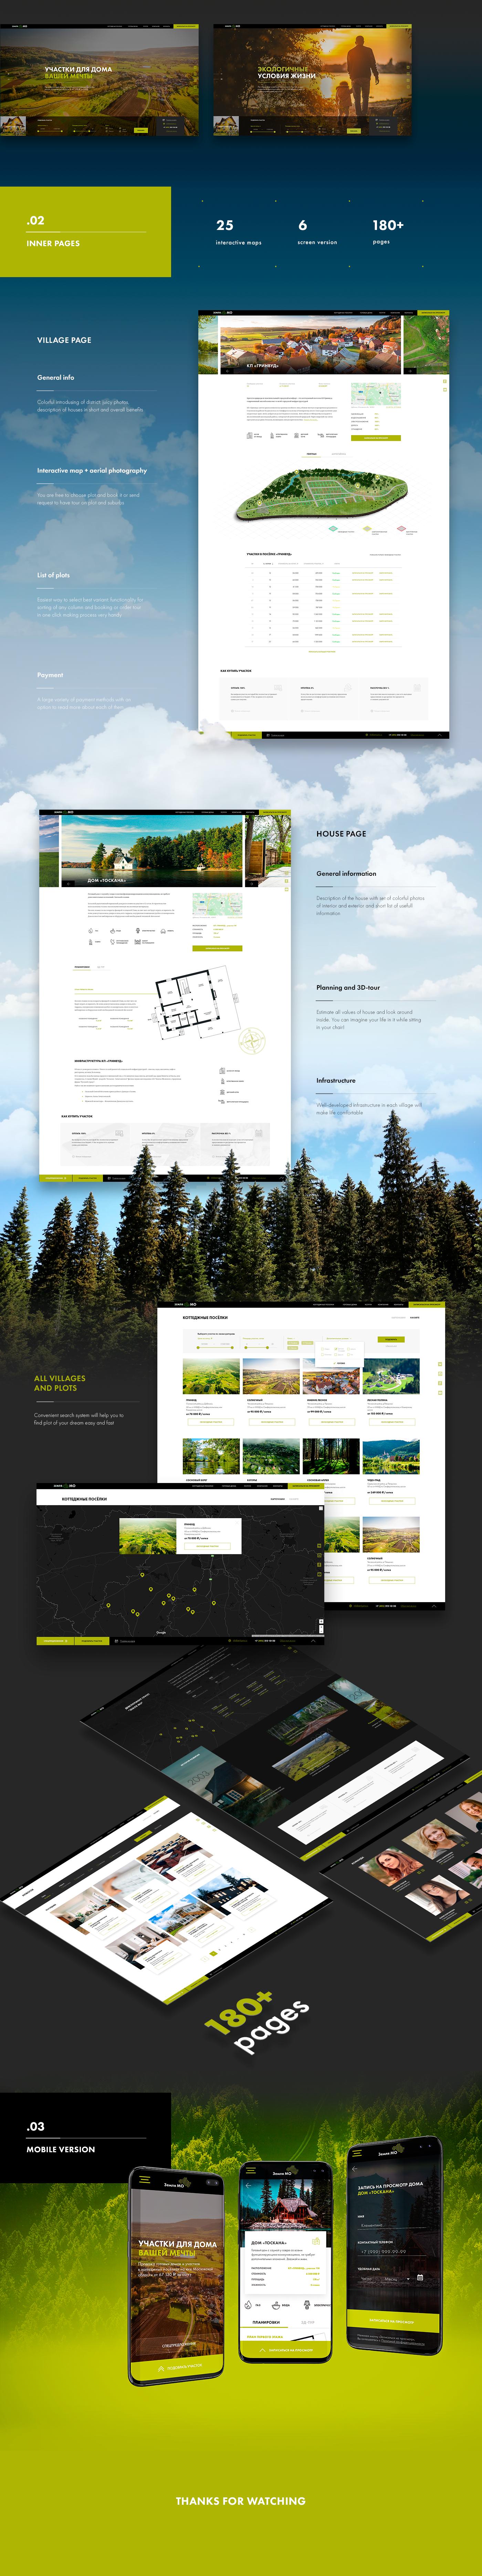 concept estate house search UI map mobile site interactive design